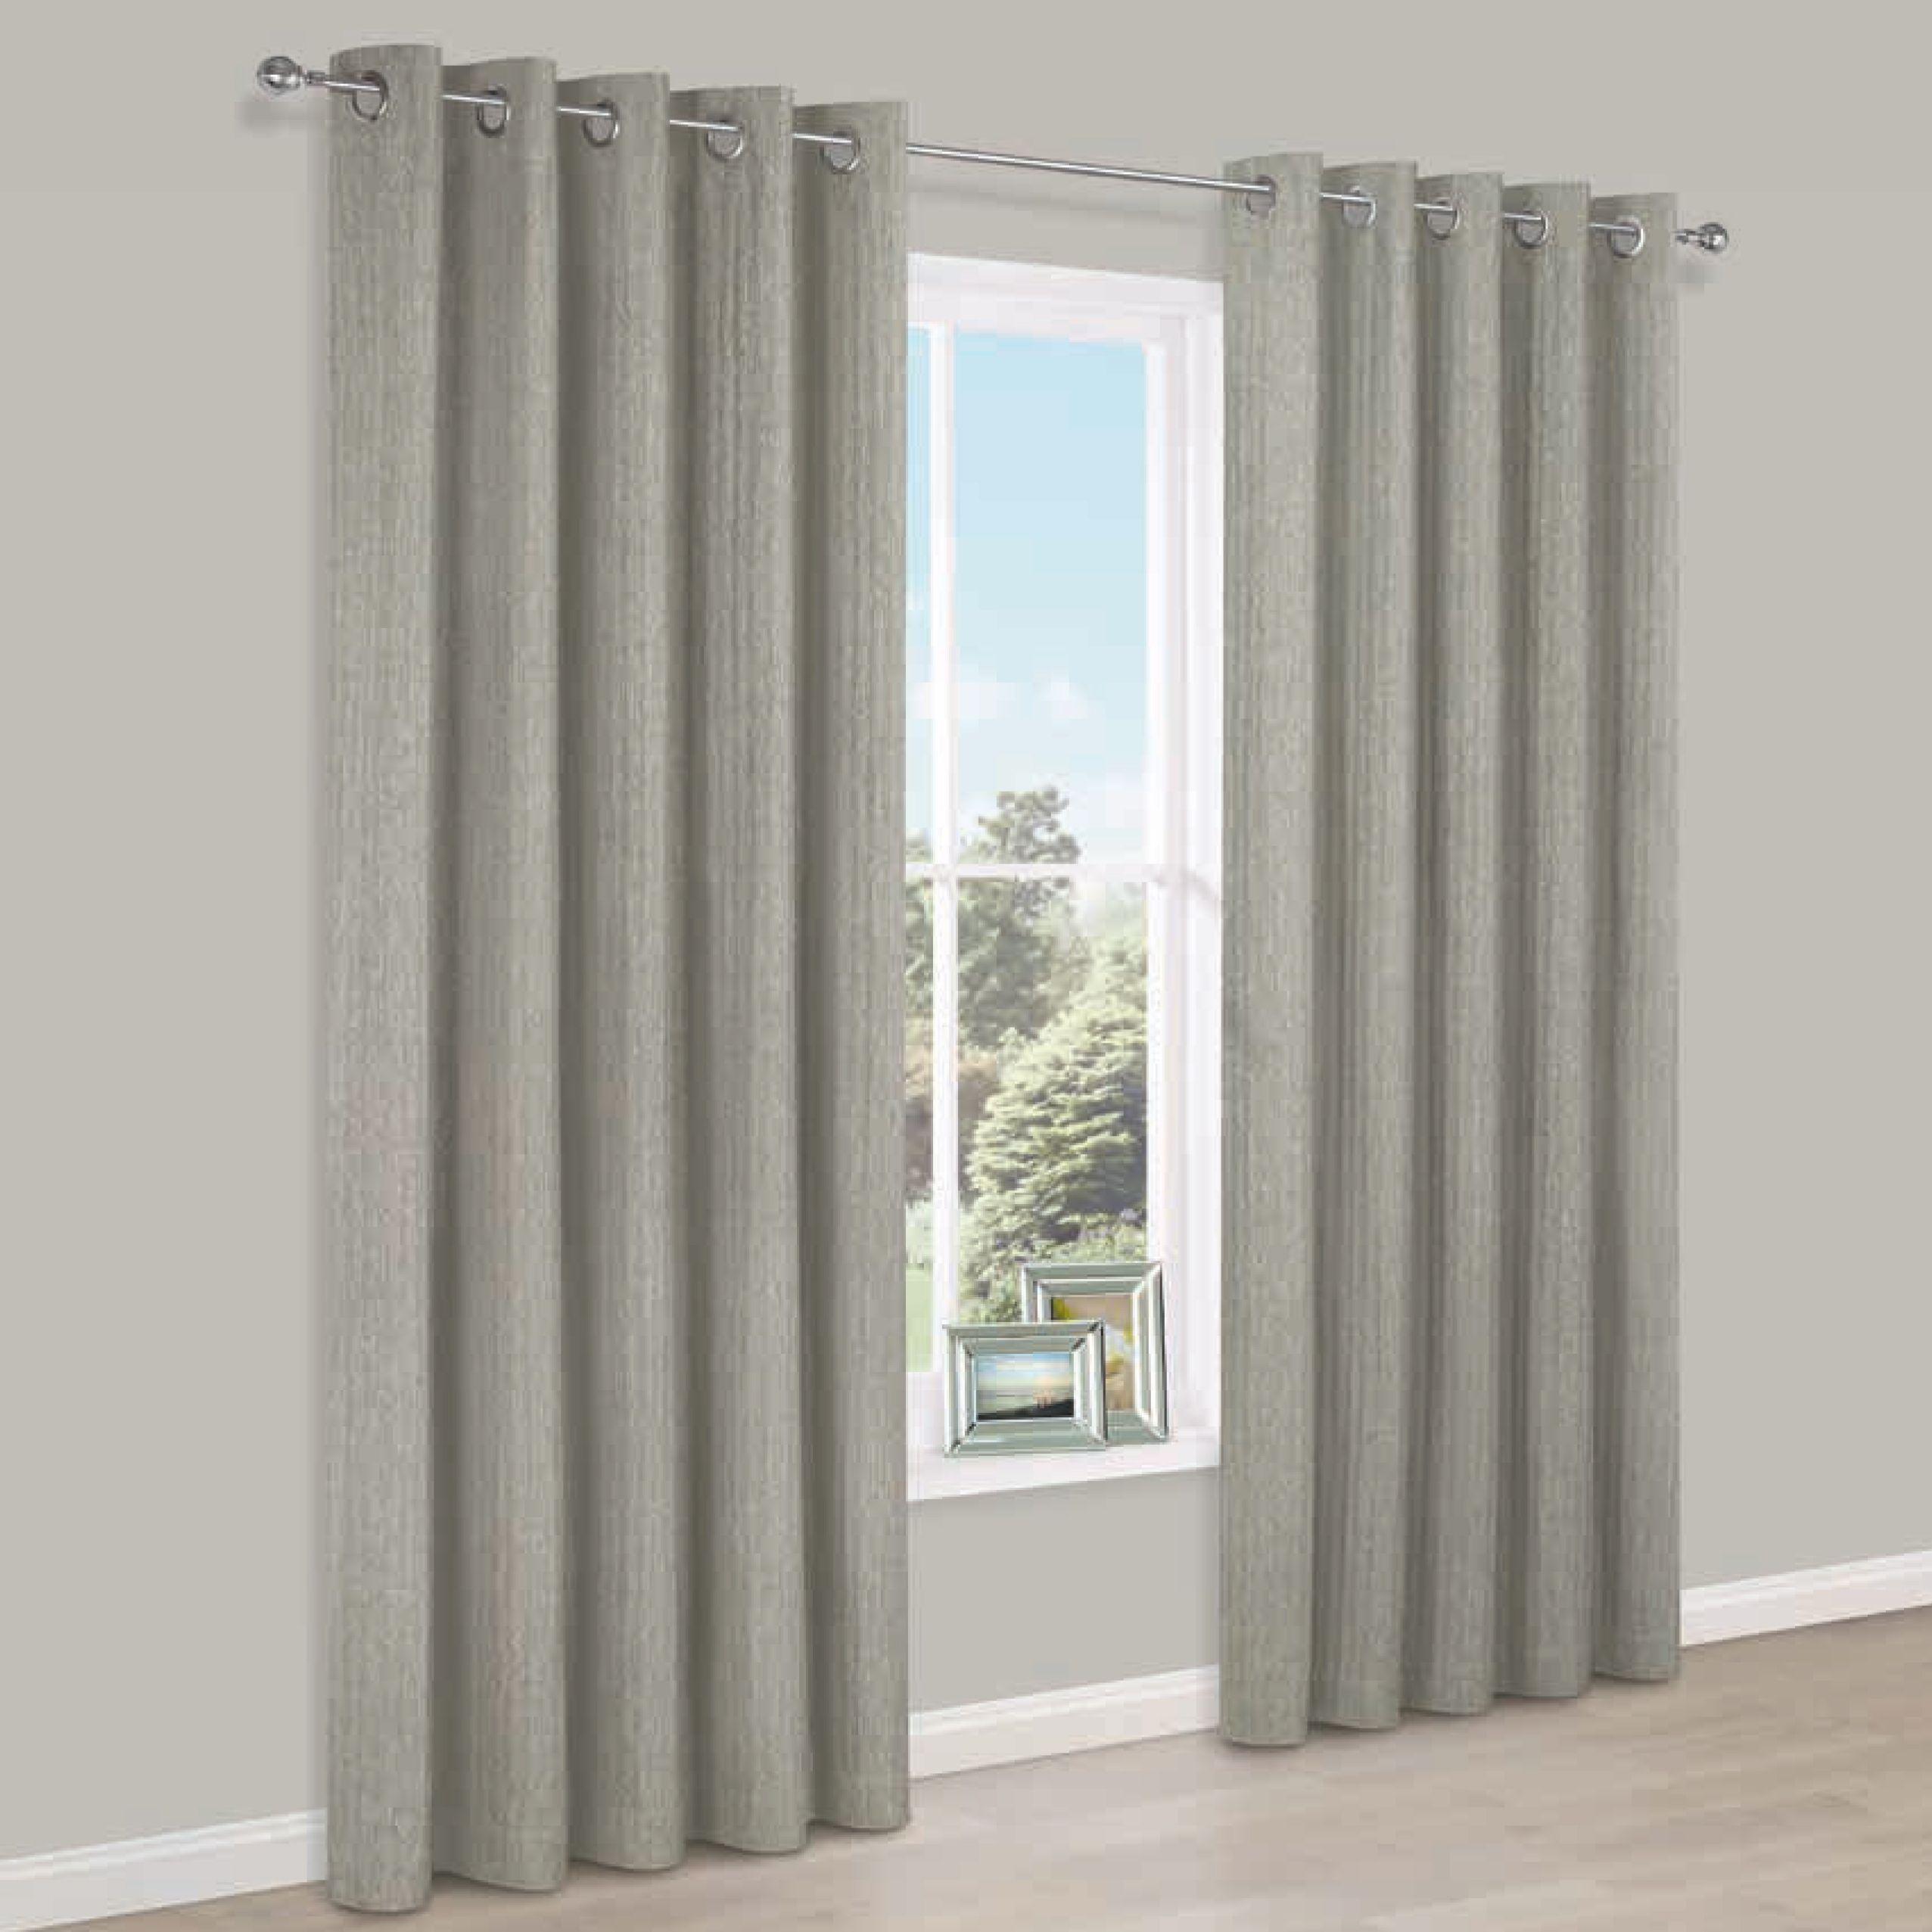 Joanna Beige Herringbone Woven Fabric Eyelet Lined Curtains (w)167 Cm (l)167 Cm